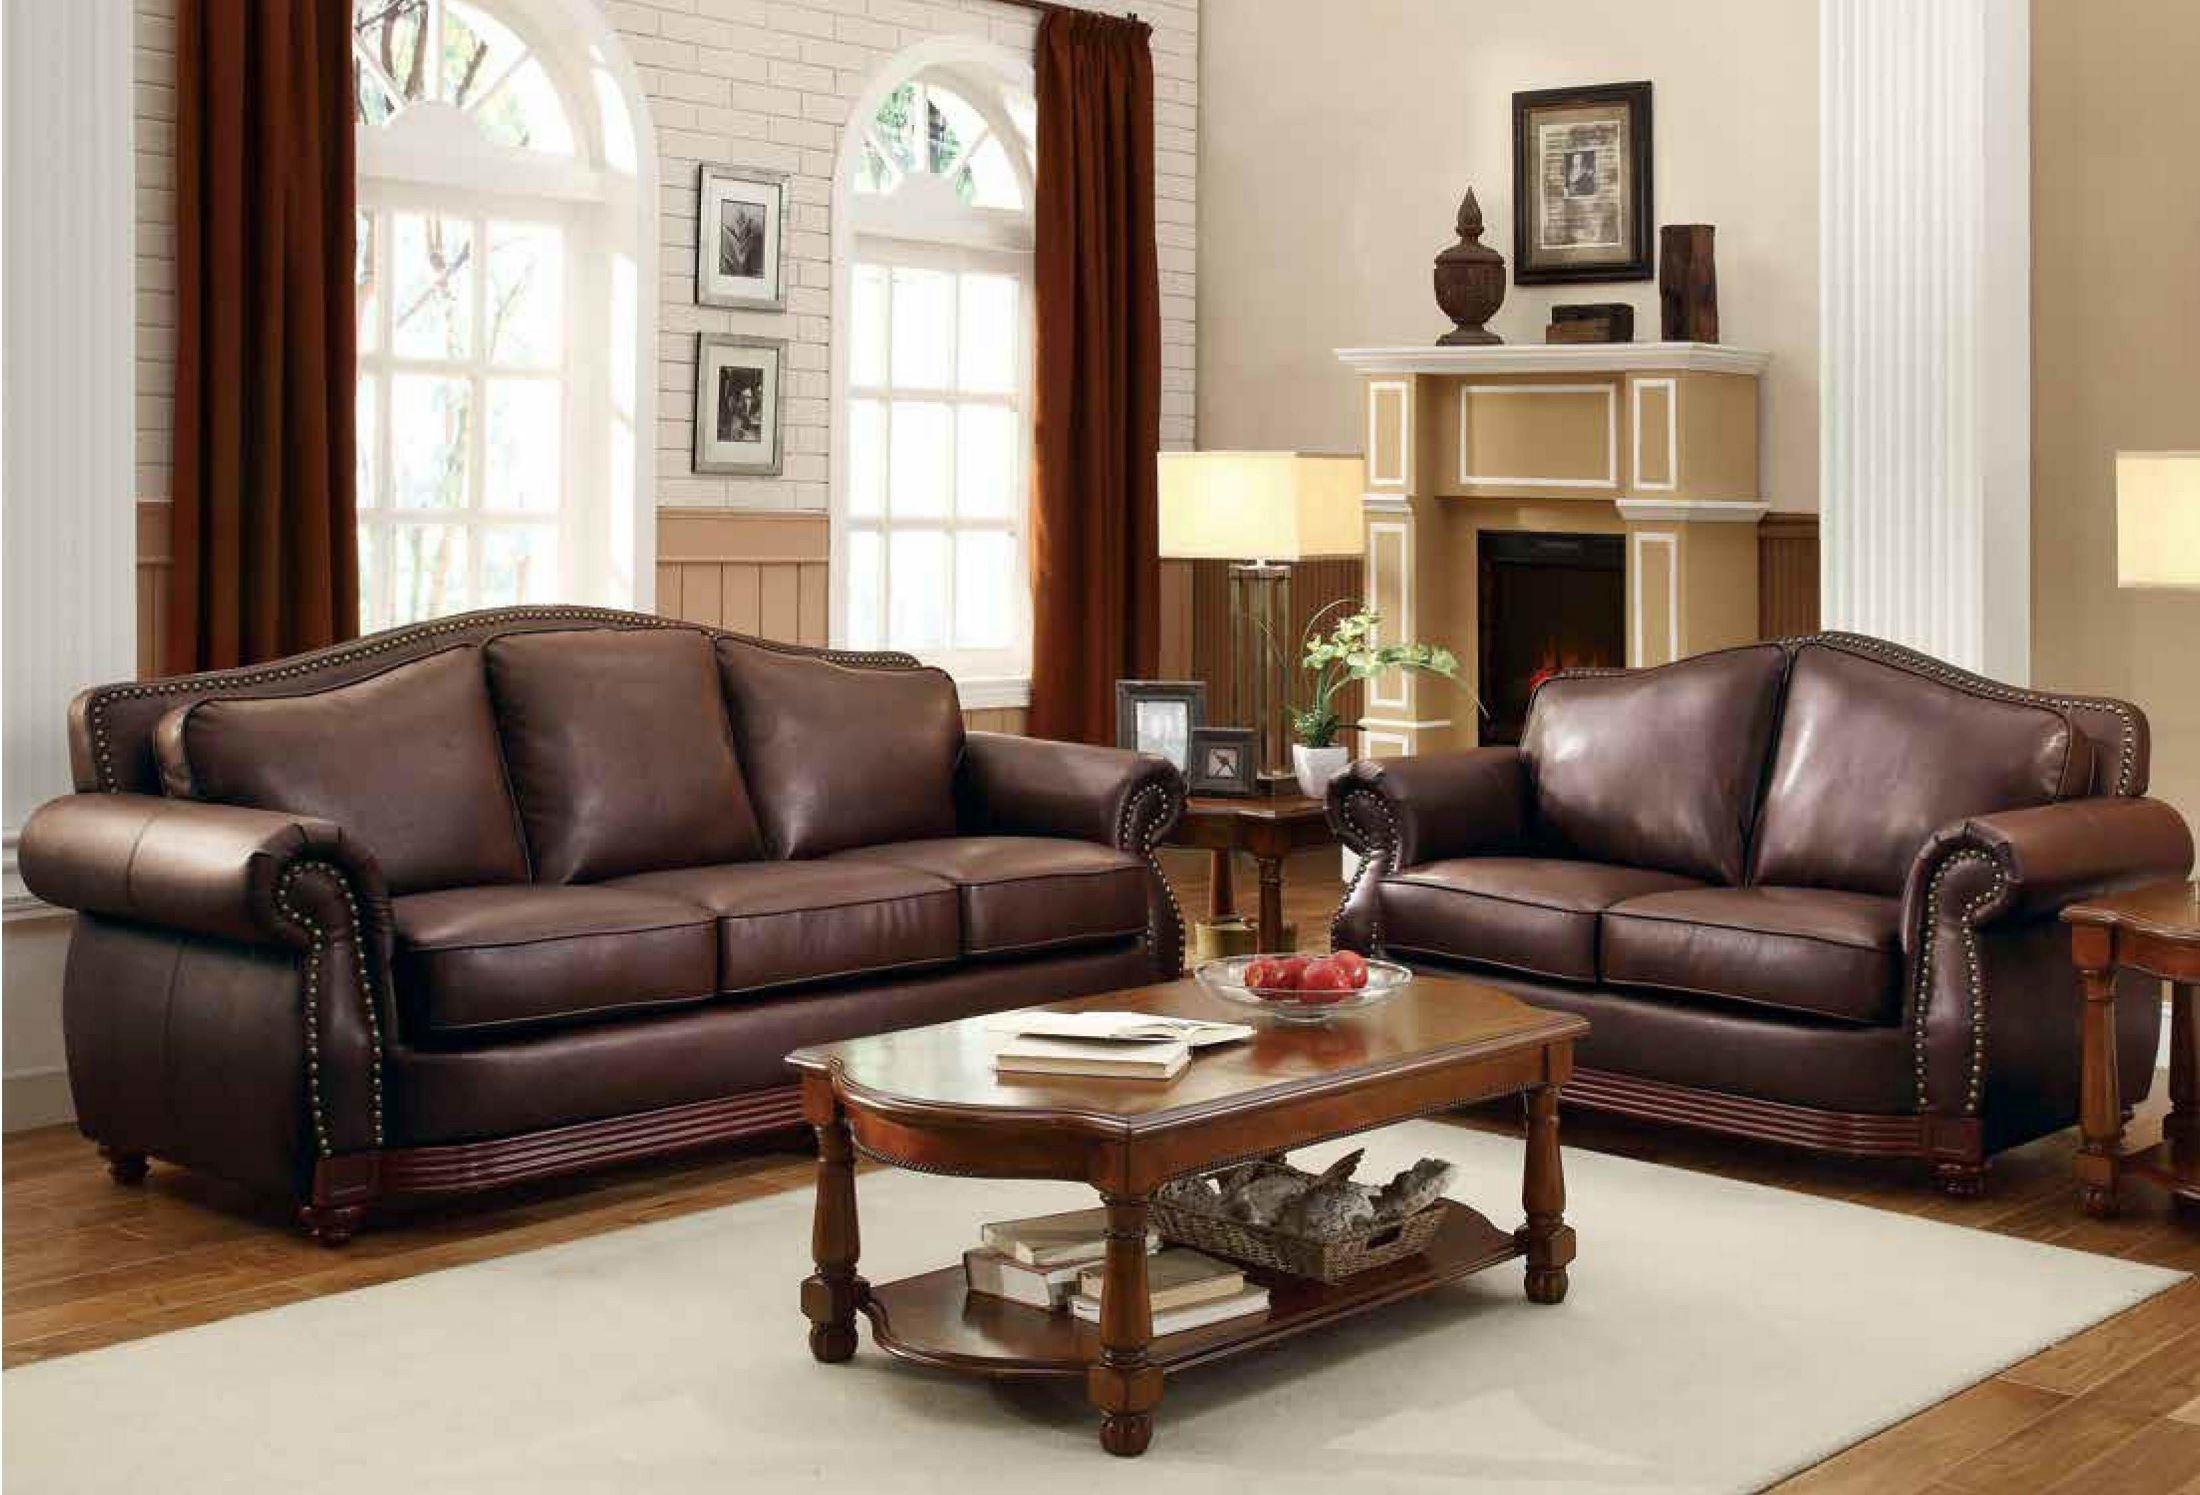 Midwood show wood living room set from homelegance for Wood living room set